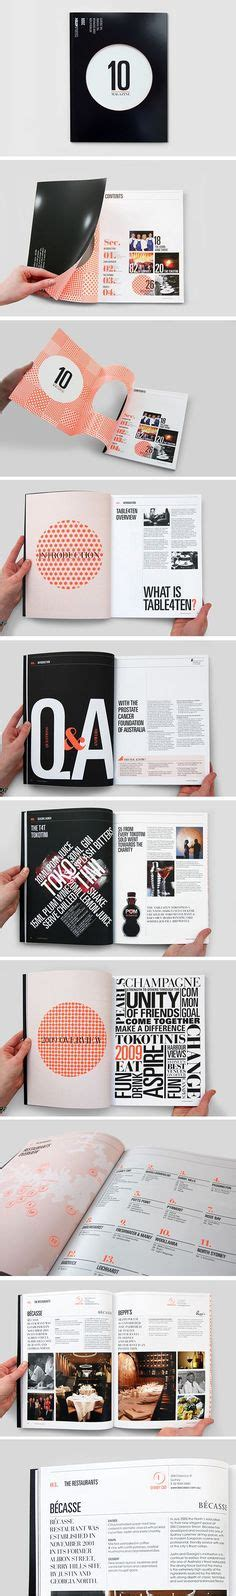 magazine layout breakdown trend breakdown new ways to use the hamburger icon